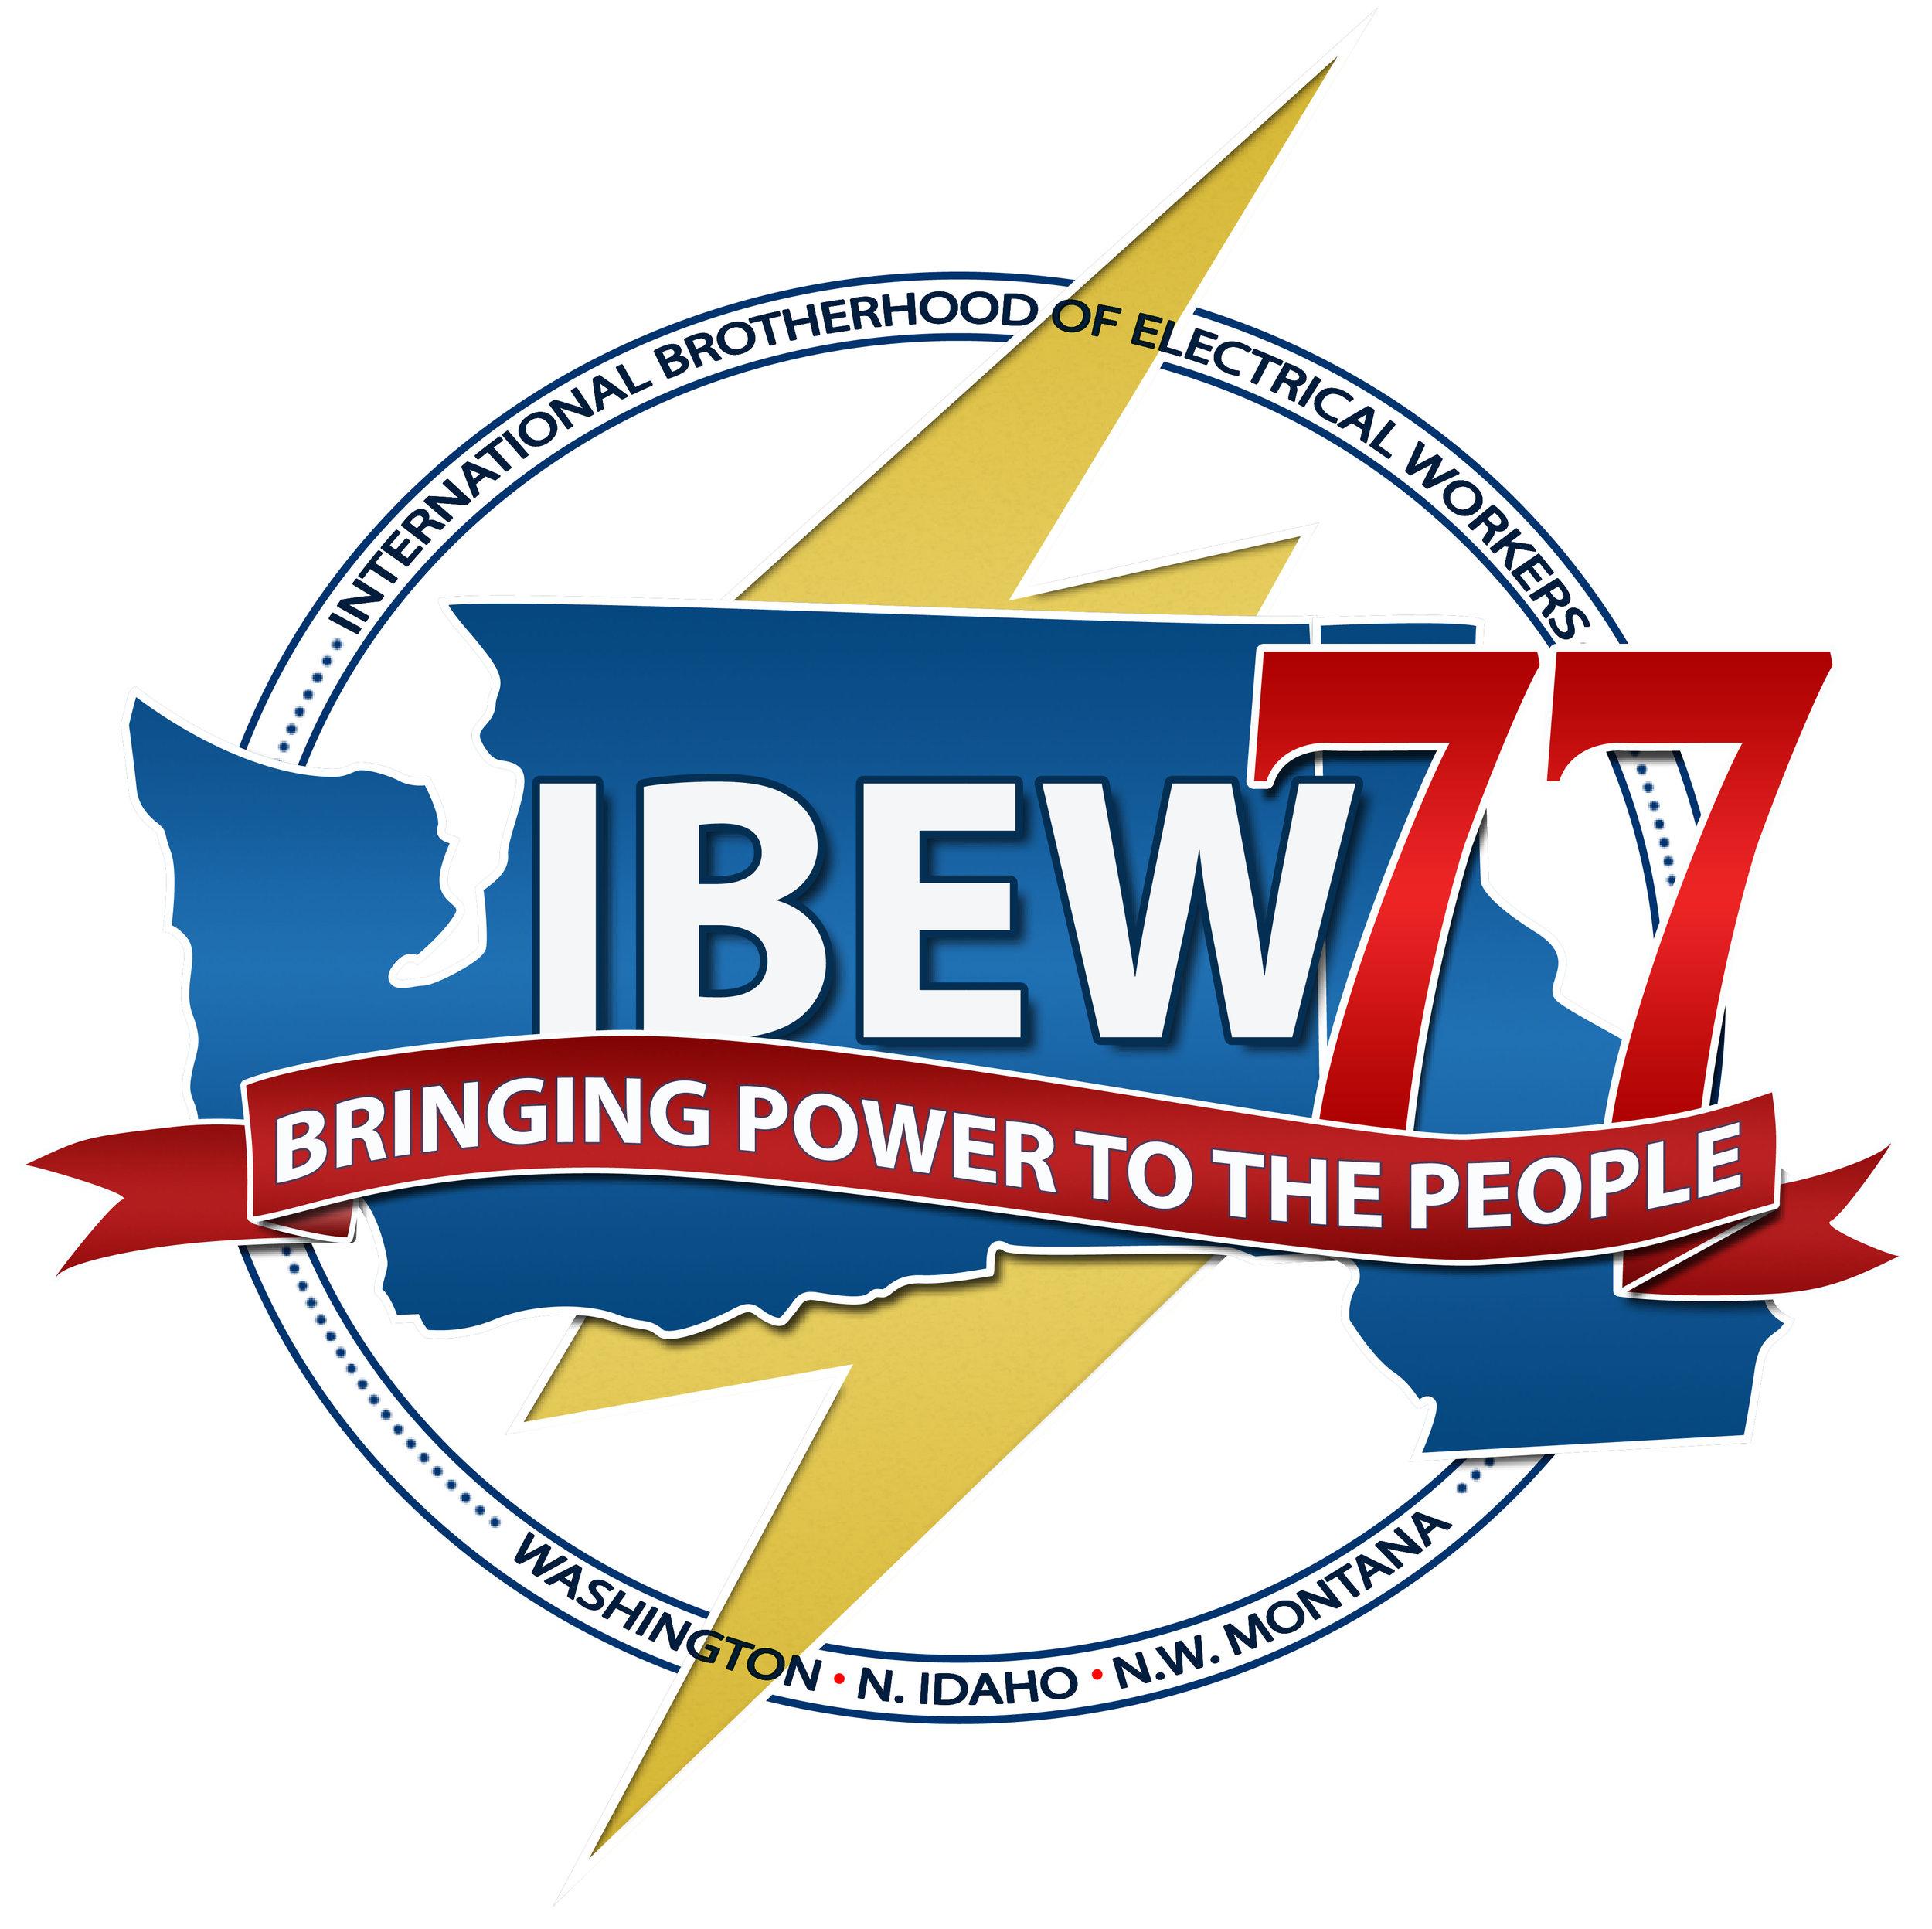 IBEW 77 (No Background).jpg